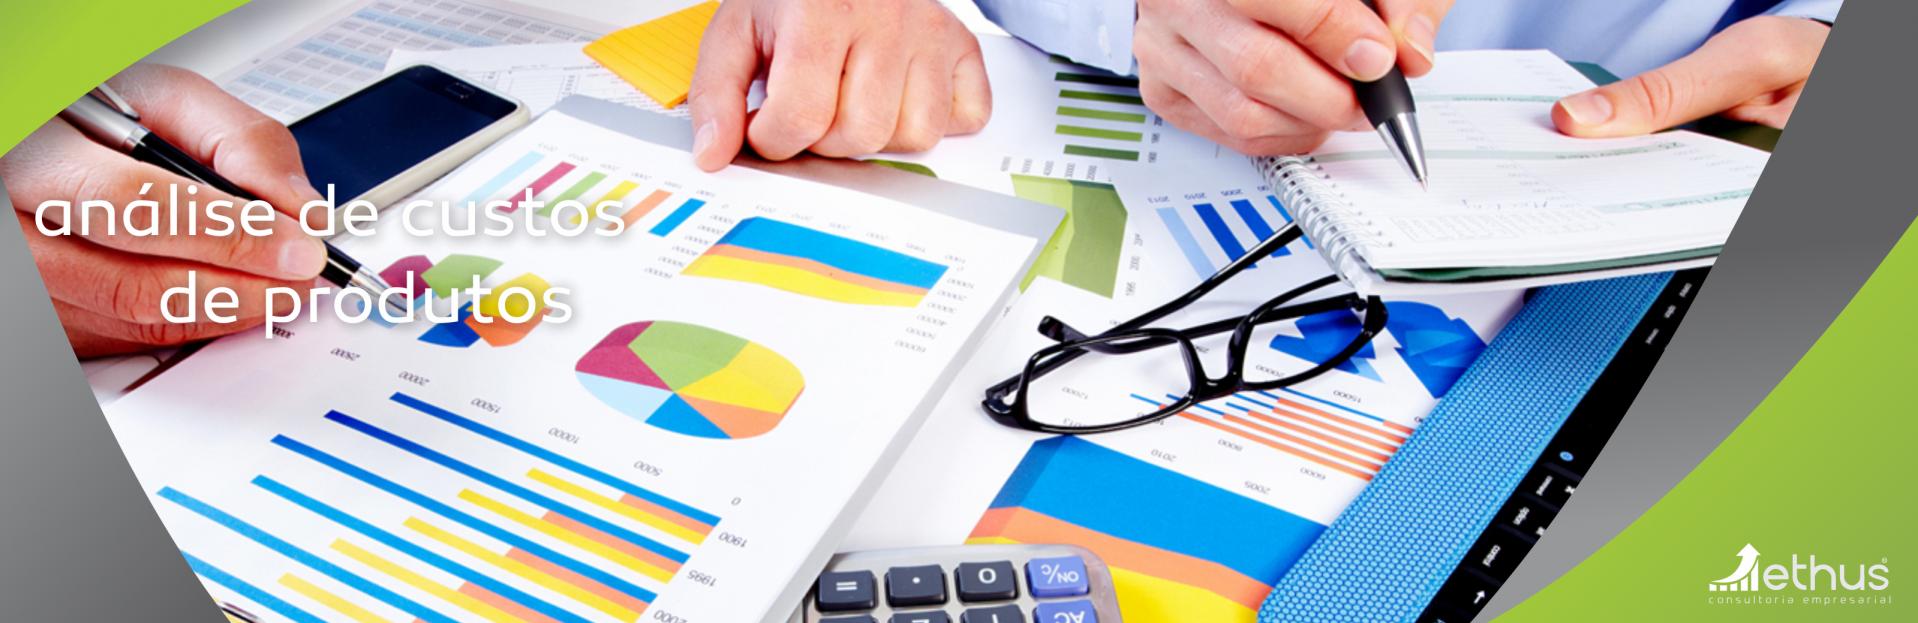 Análise de custos de produtos